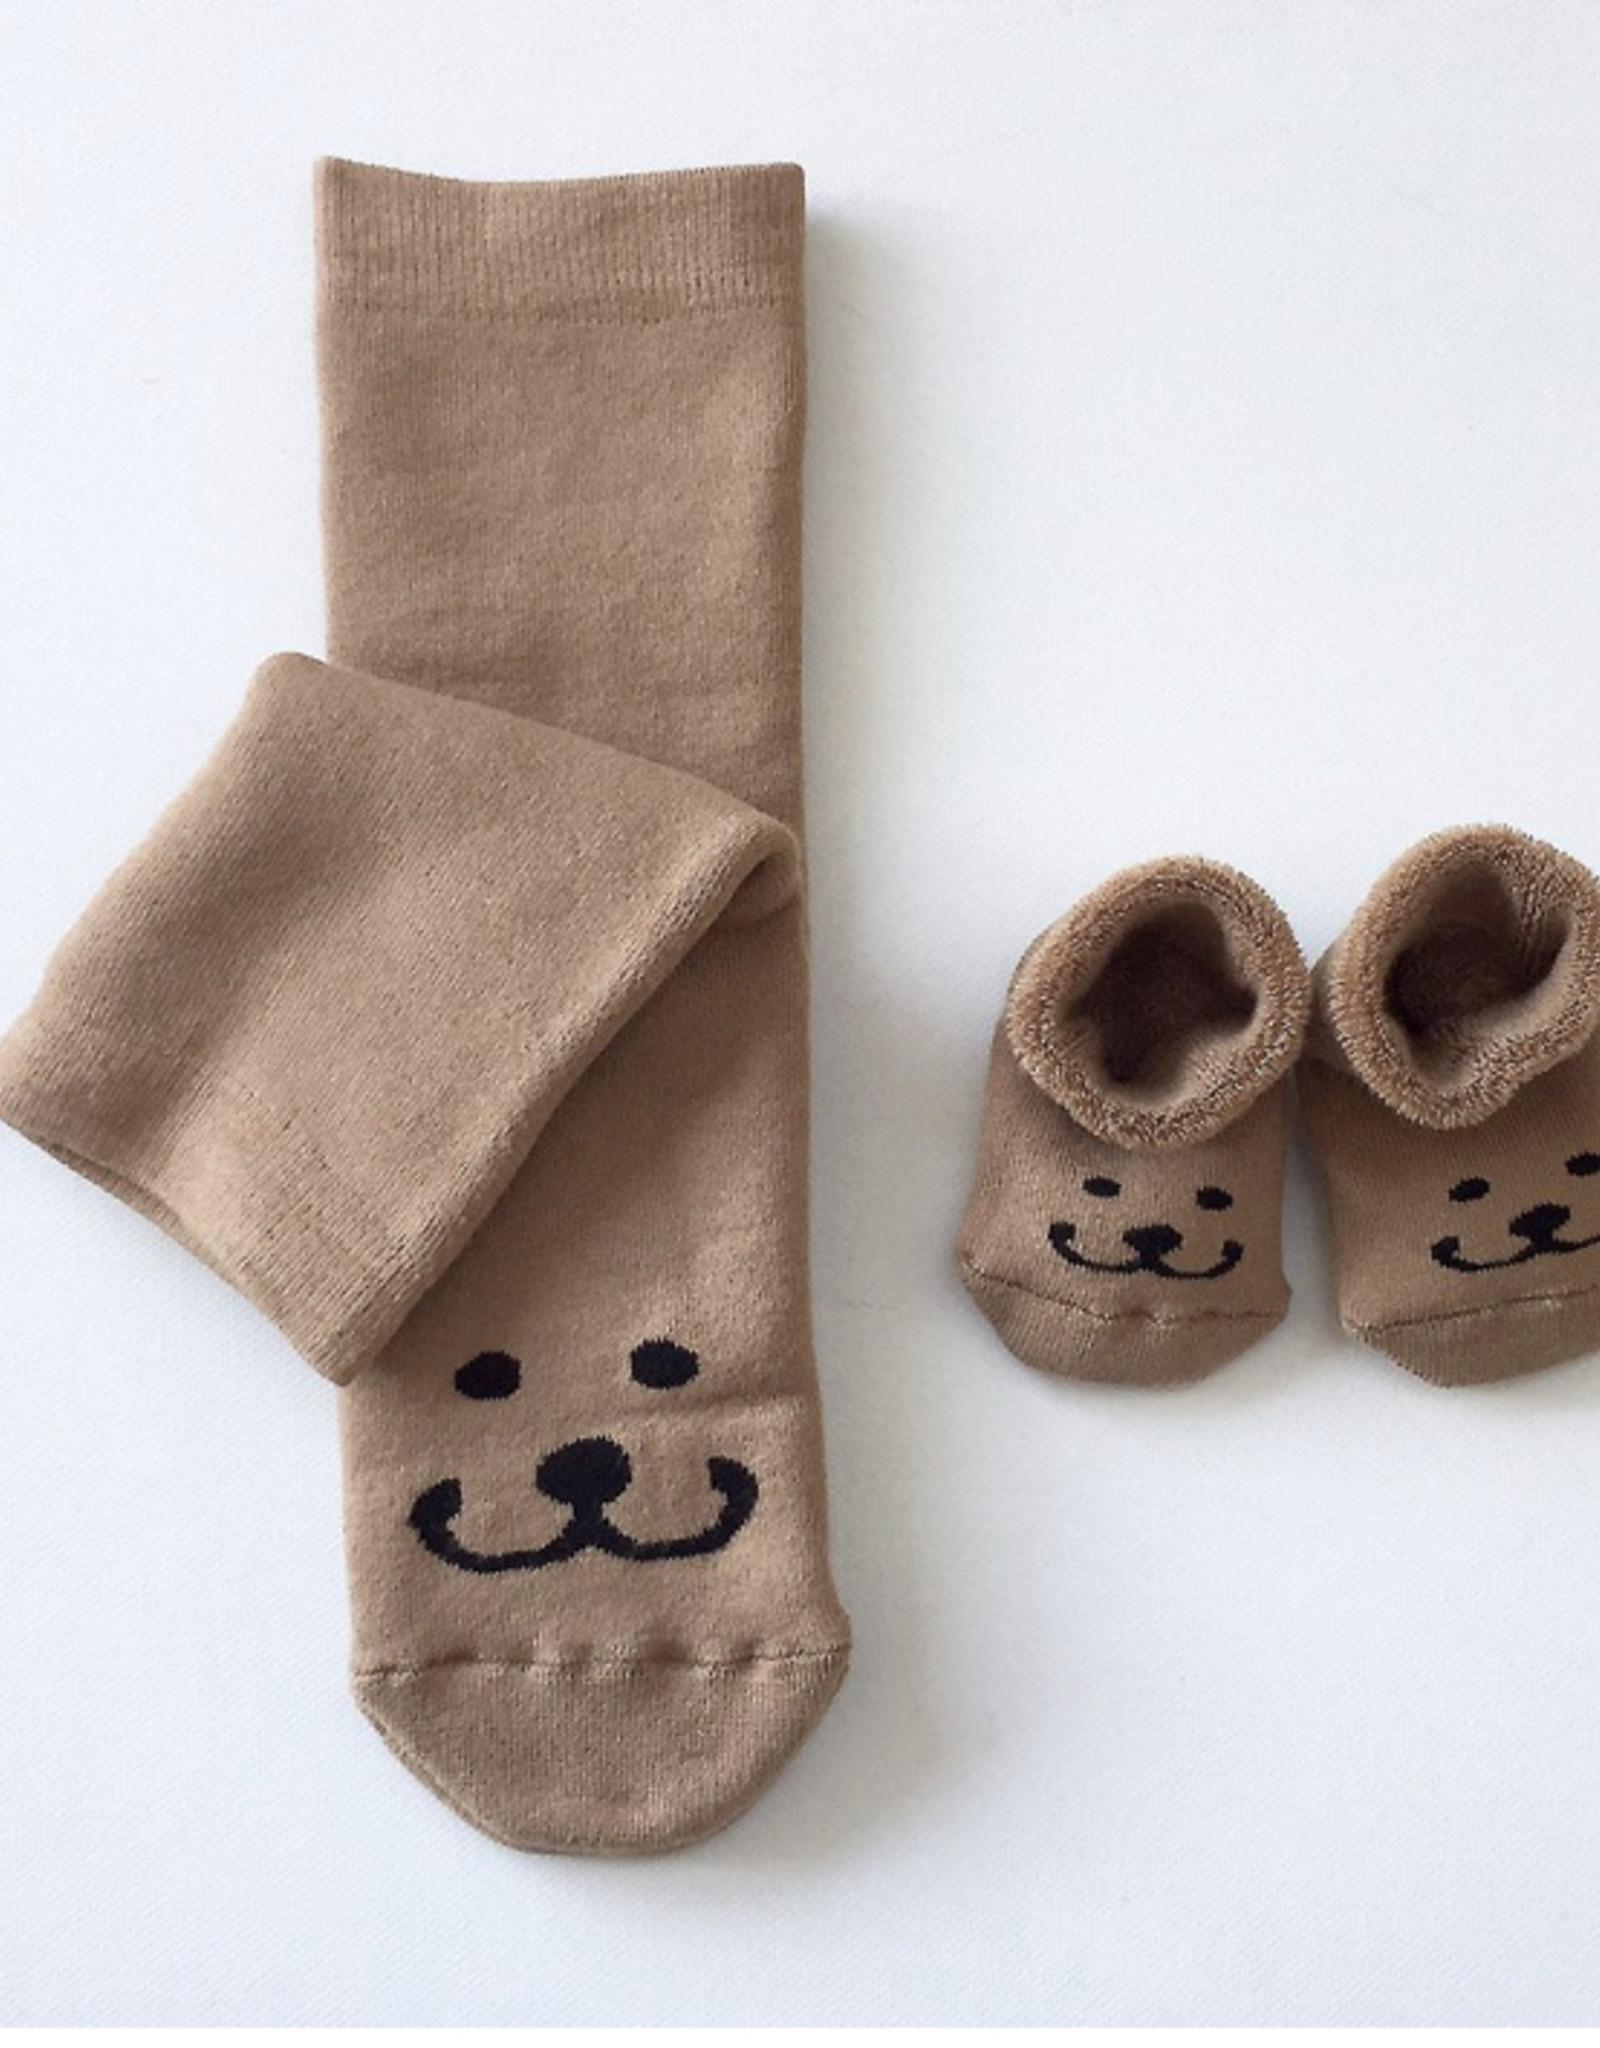 Hektik Set sokken mama en baby - Brom beer